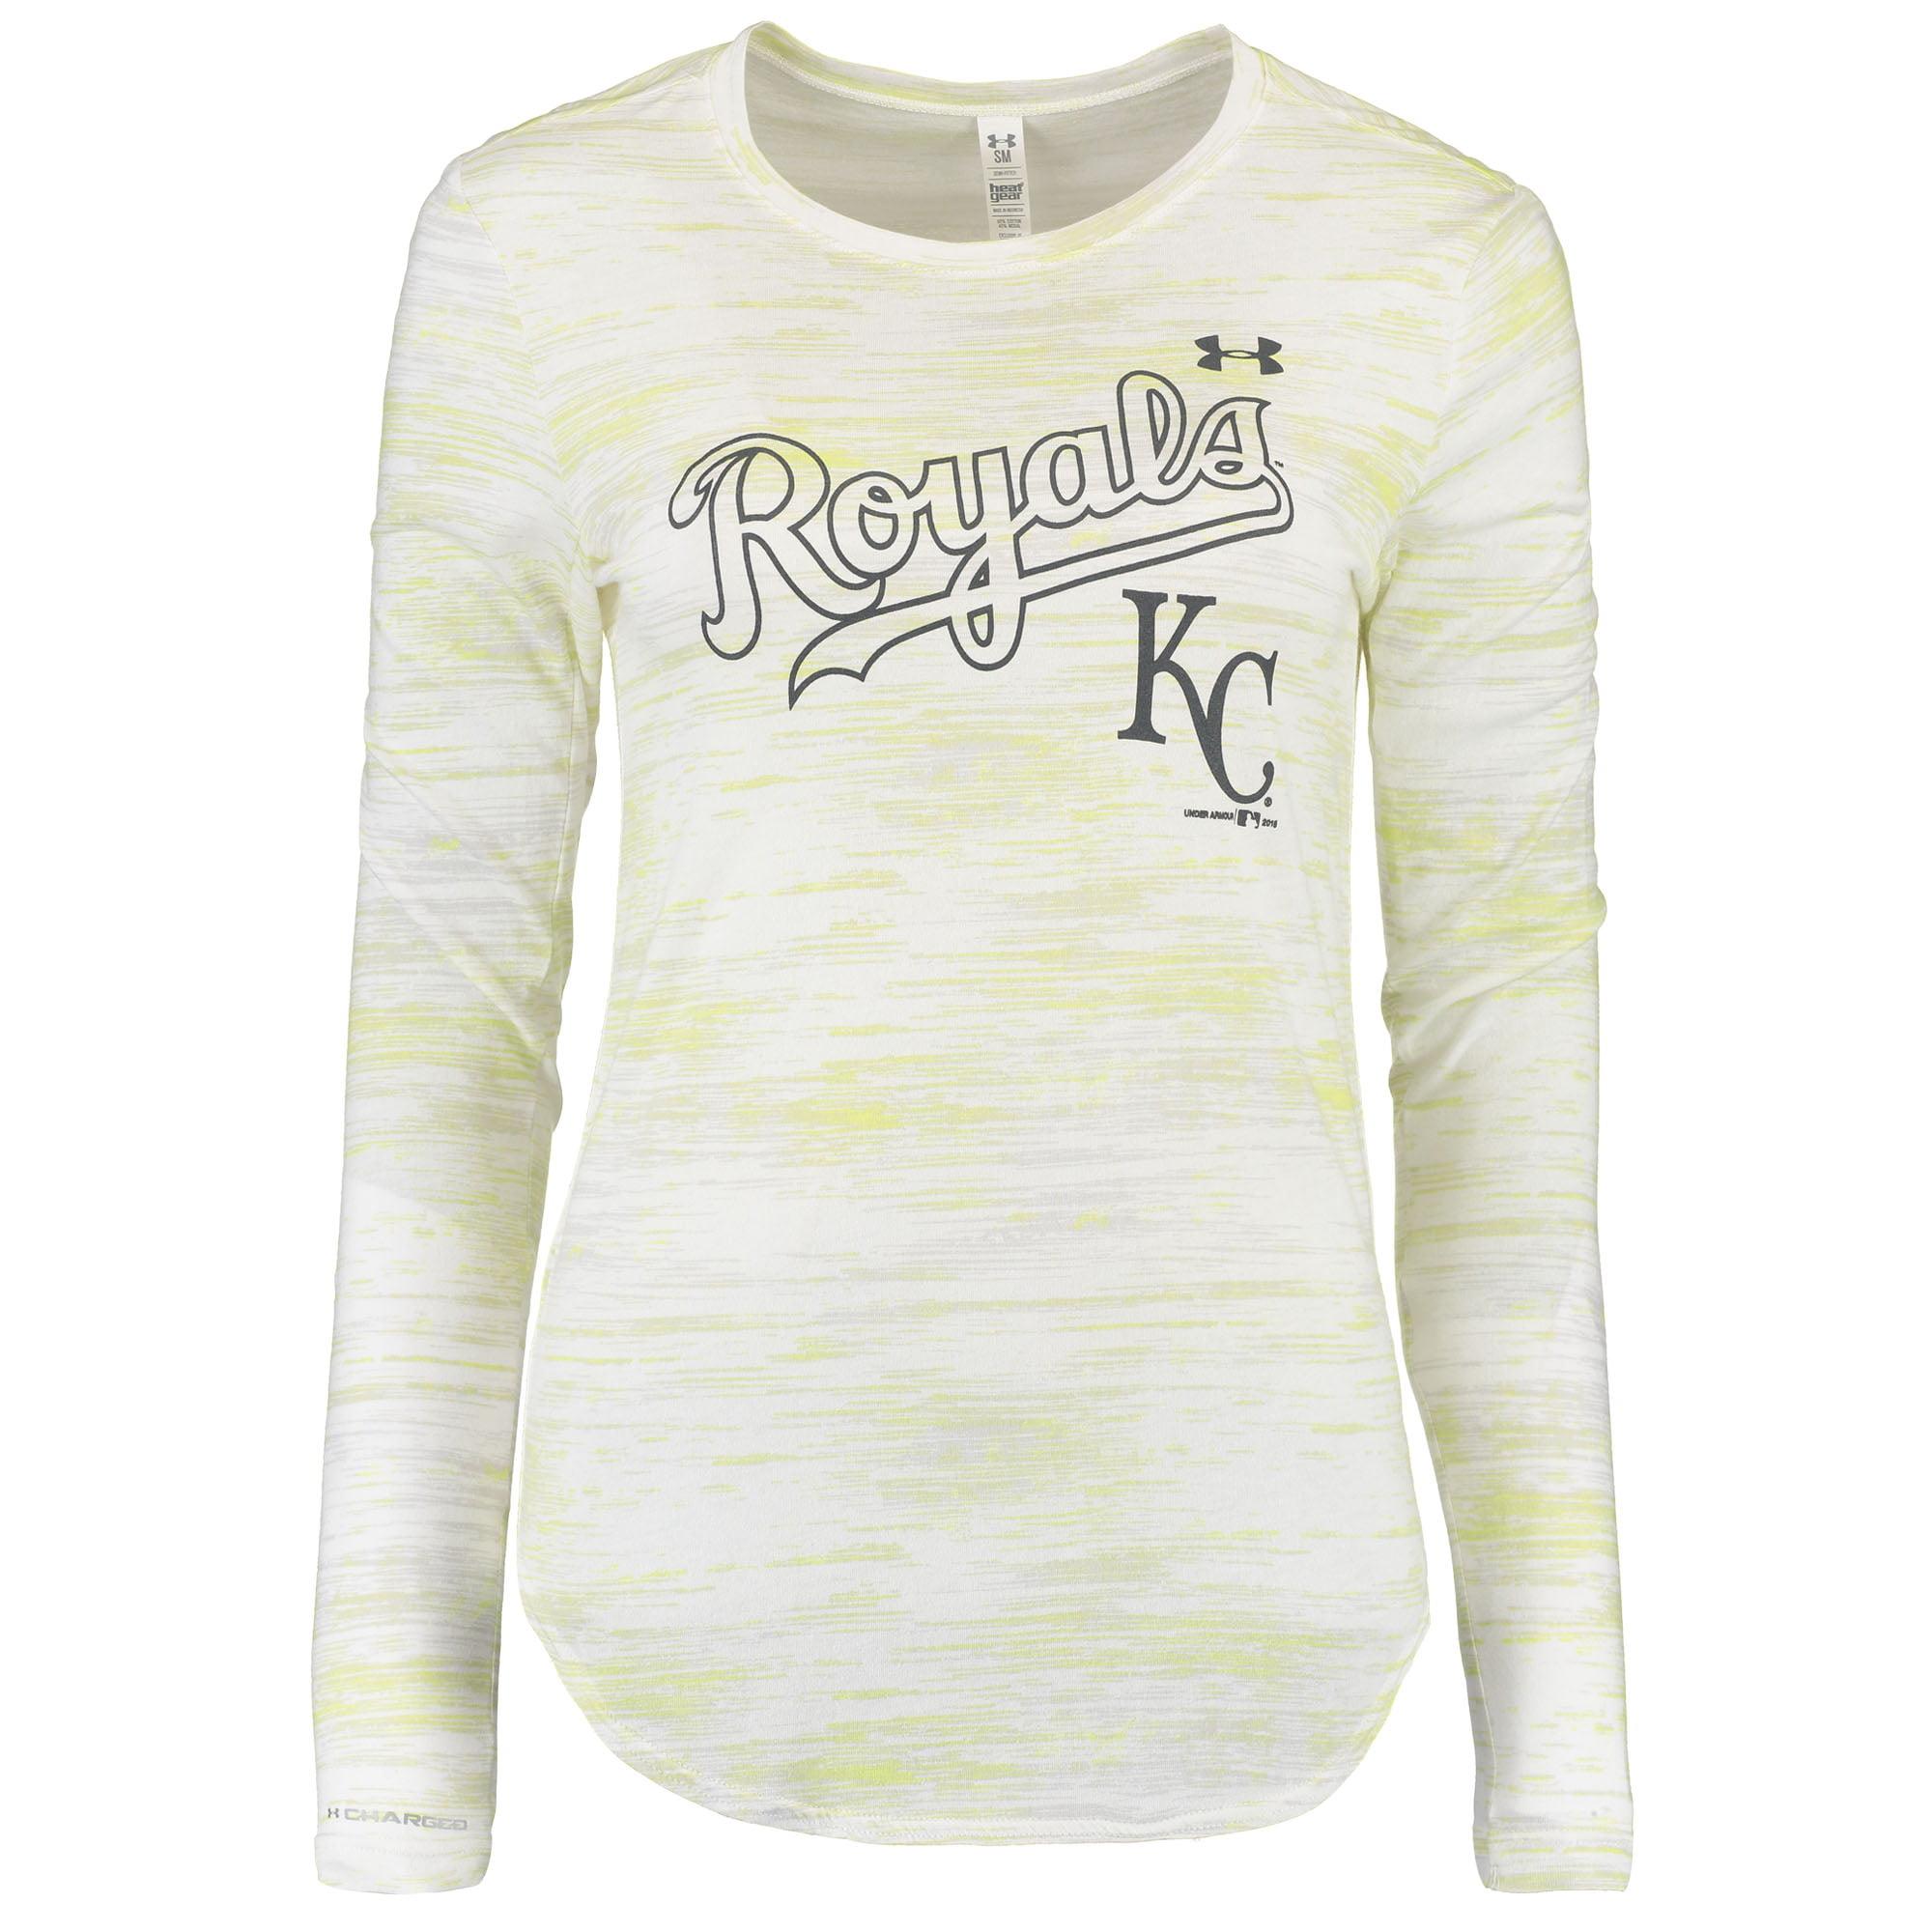 Kansas City Royals Under Armour Women's Novelty Long Sleeve Performance T-Shirt - White/Gold